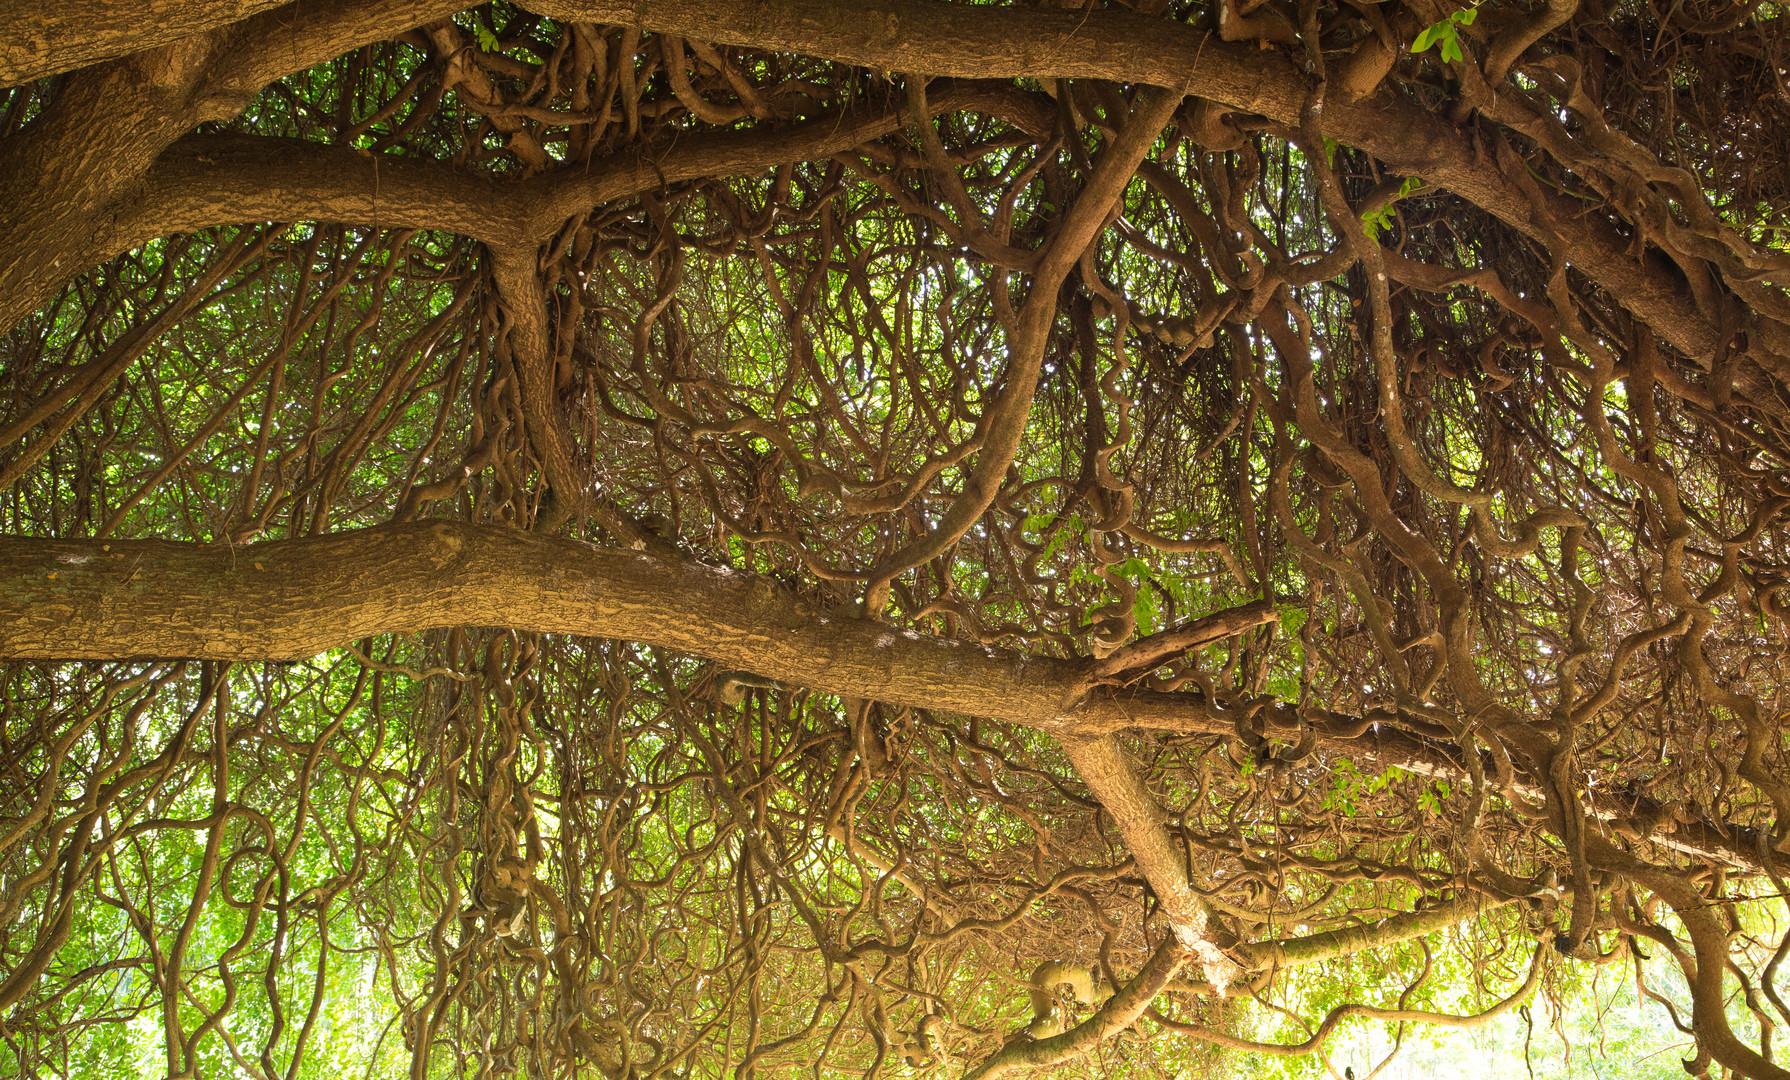 """Märchenbaum"" im National Tropical Botanical Garden auf Kauai"